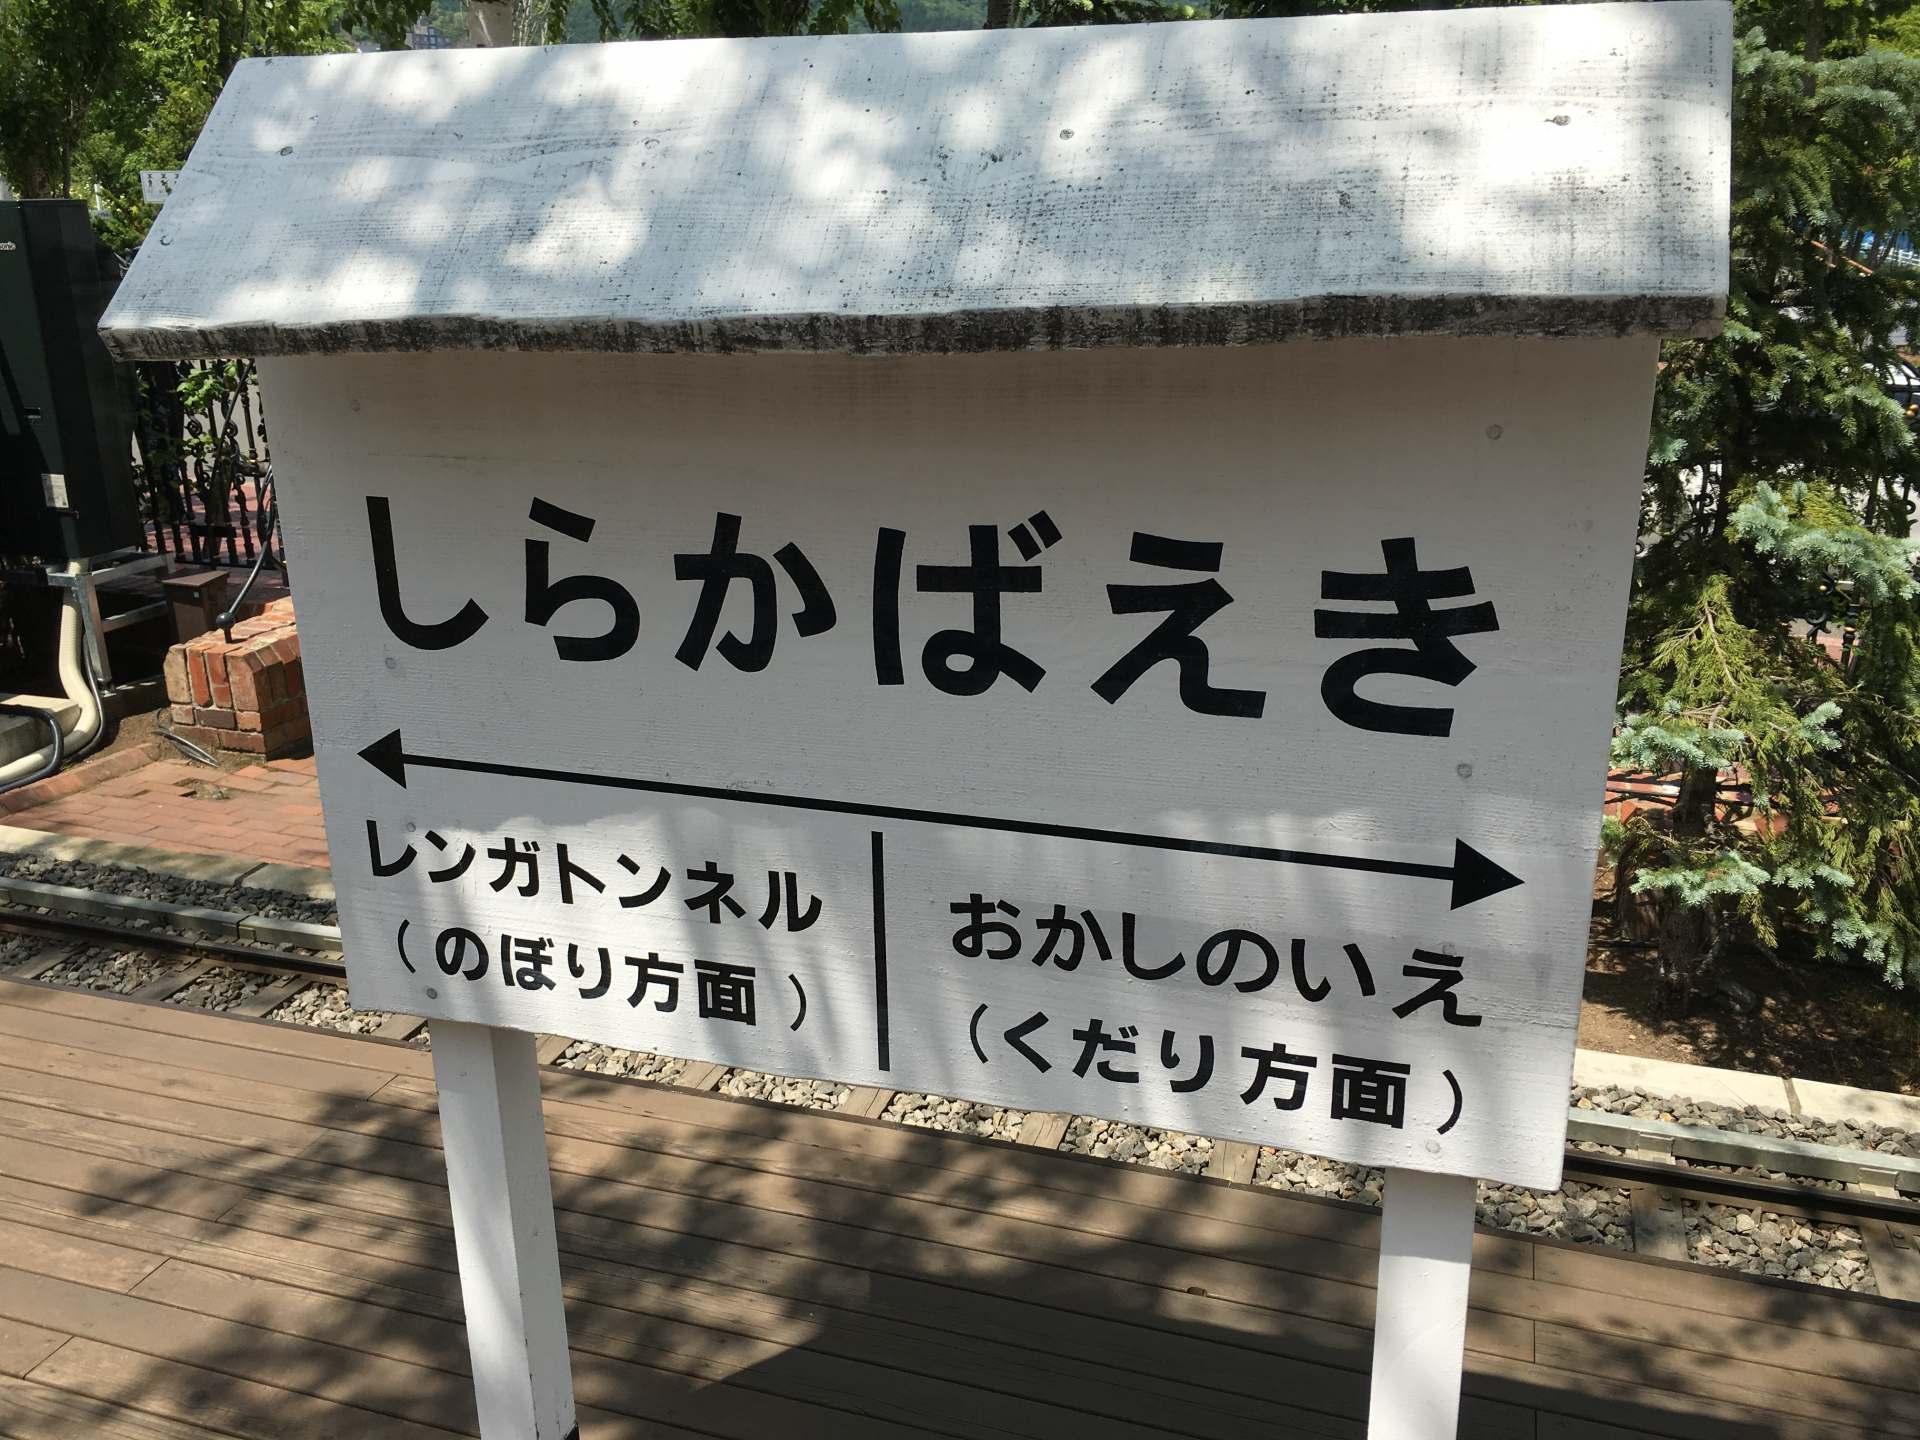 The Shirakaba Station sign